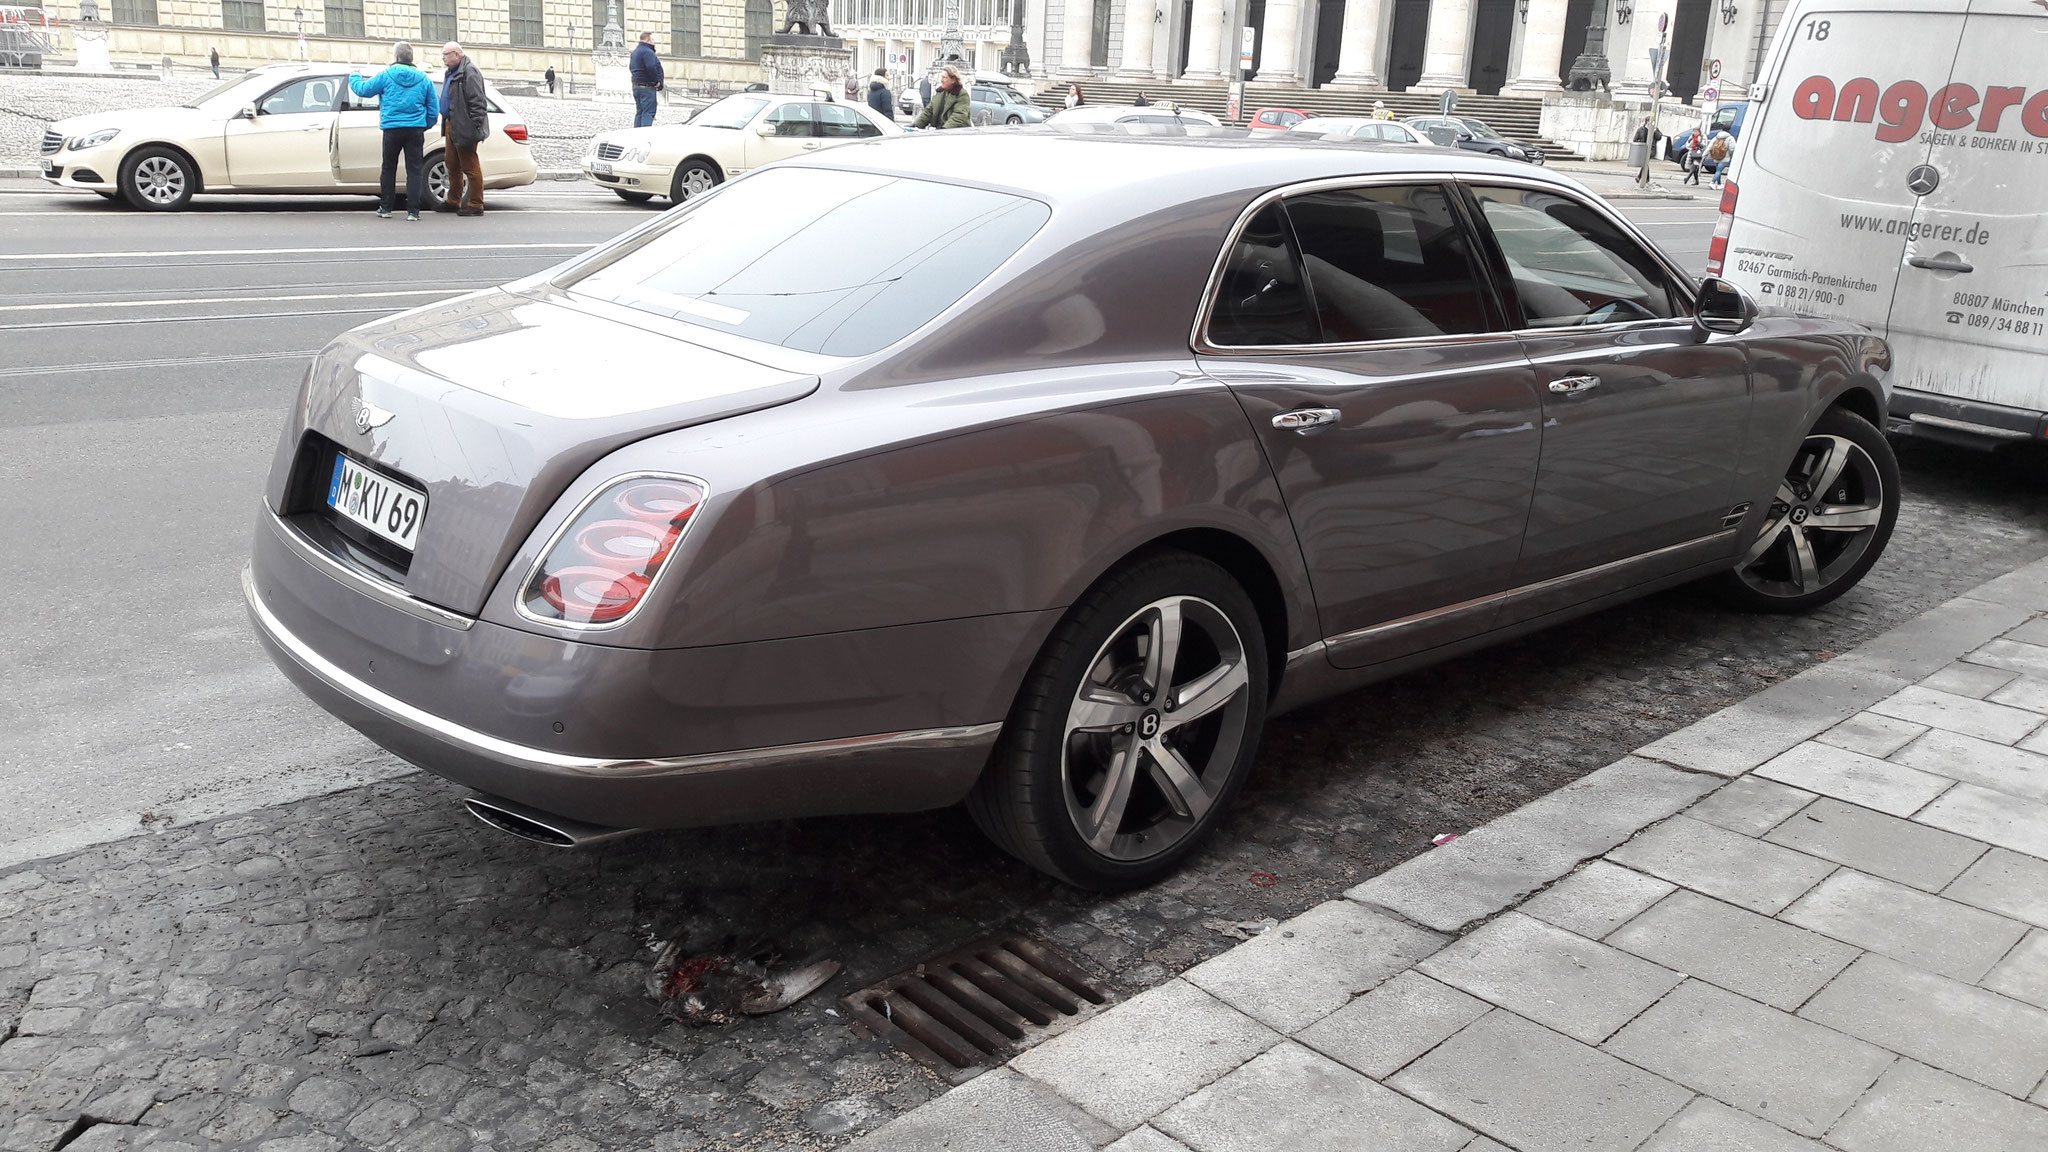 Bentley Mulsanne - M-KV-69